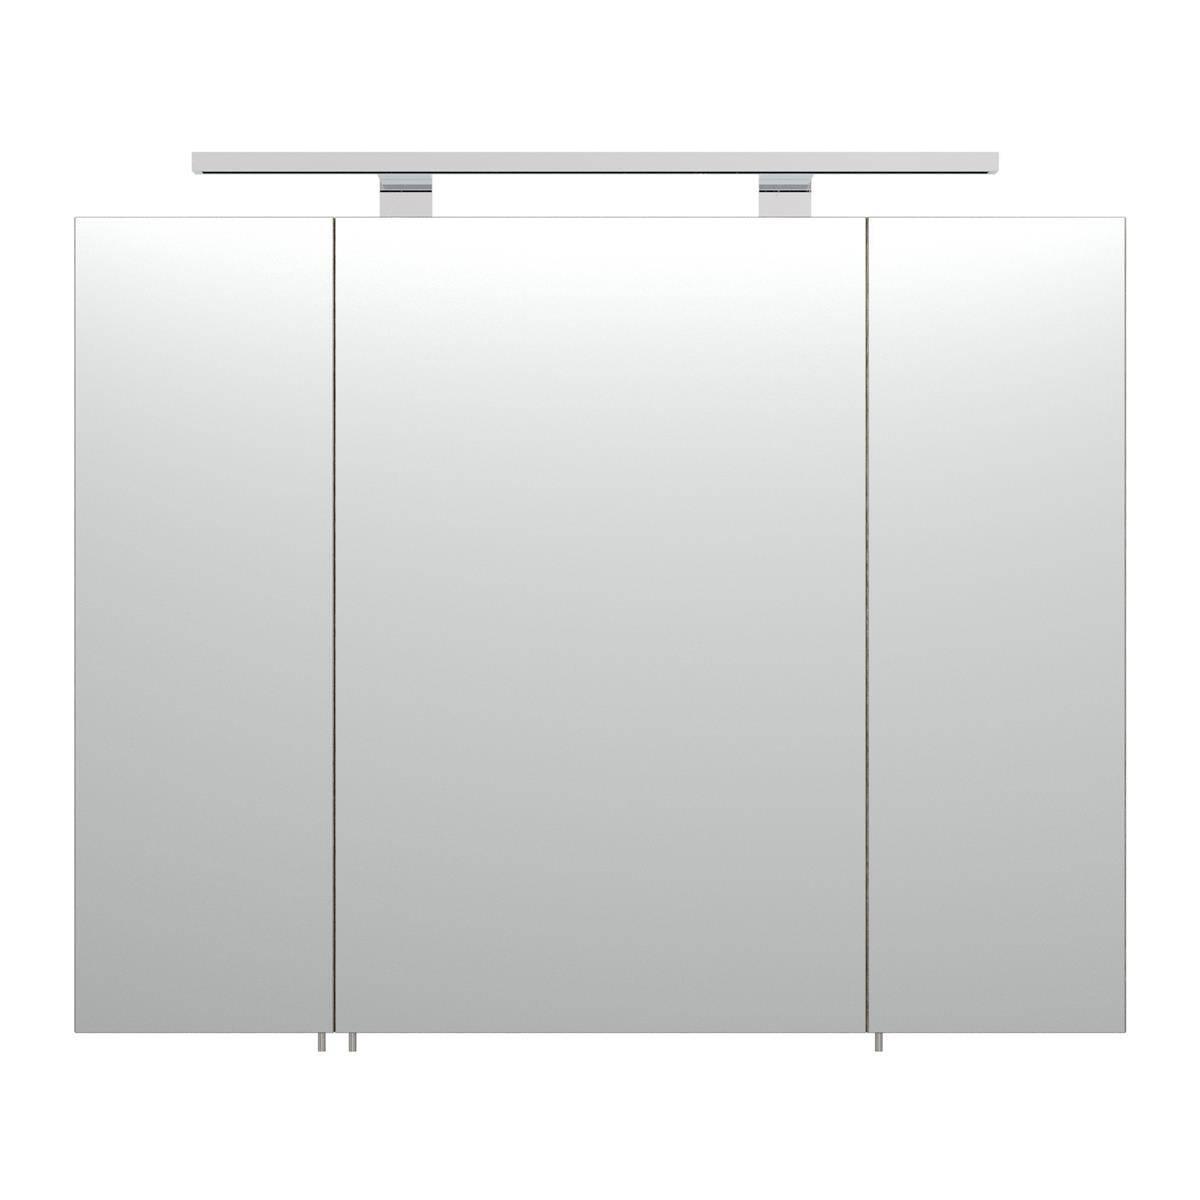 spiegelschrank rimao 100 sonoma eiche led beleuchtung. Black Bedroom Furniture Sets. Home Design Ideas